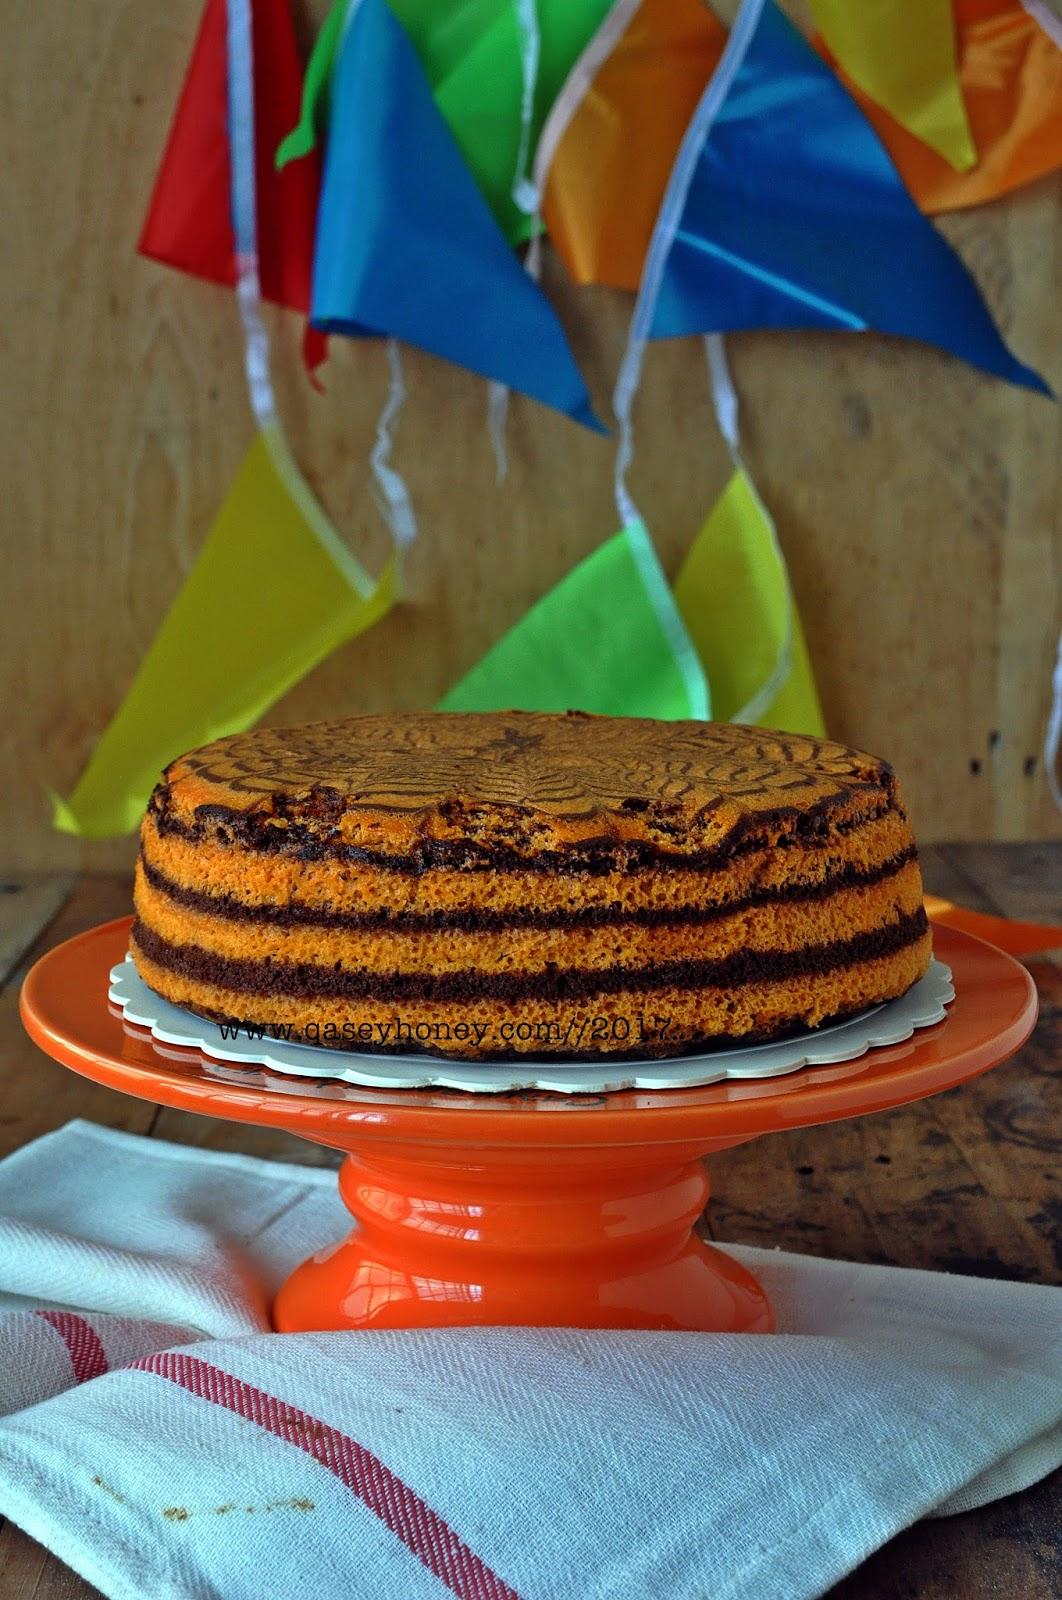 Kek Marble Ogura Coklat Oren Qasey Honey